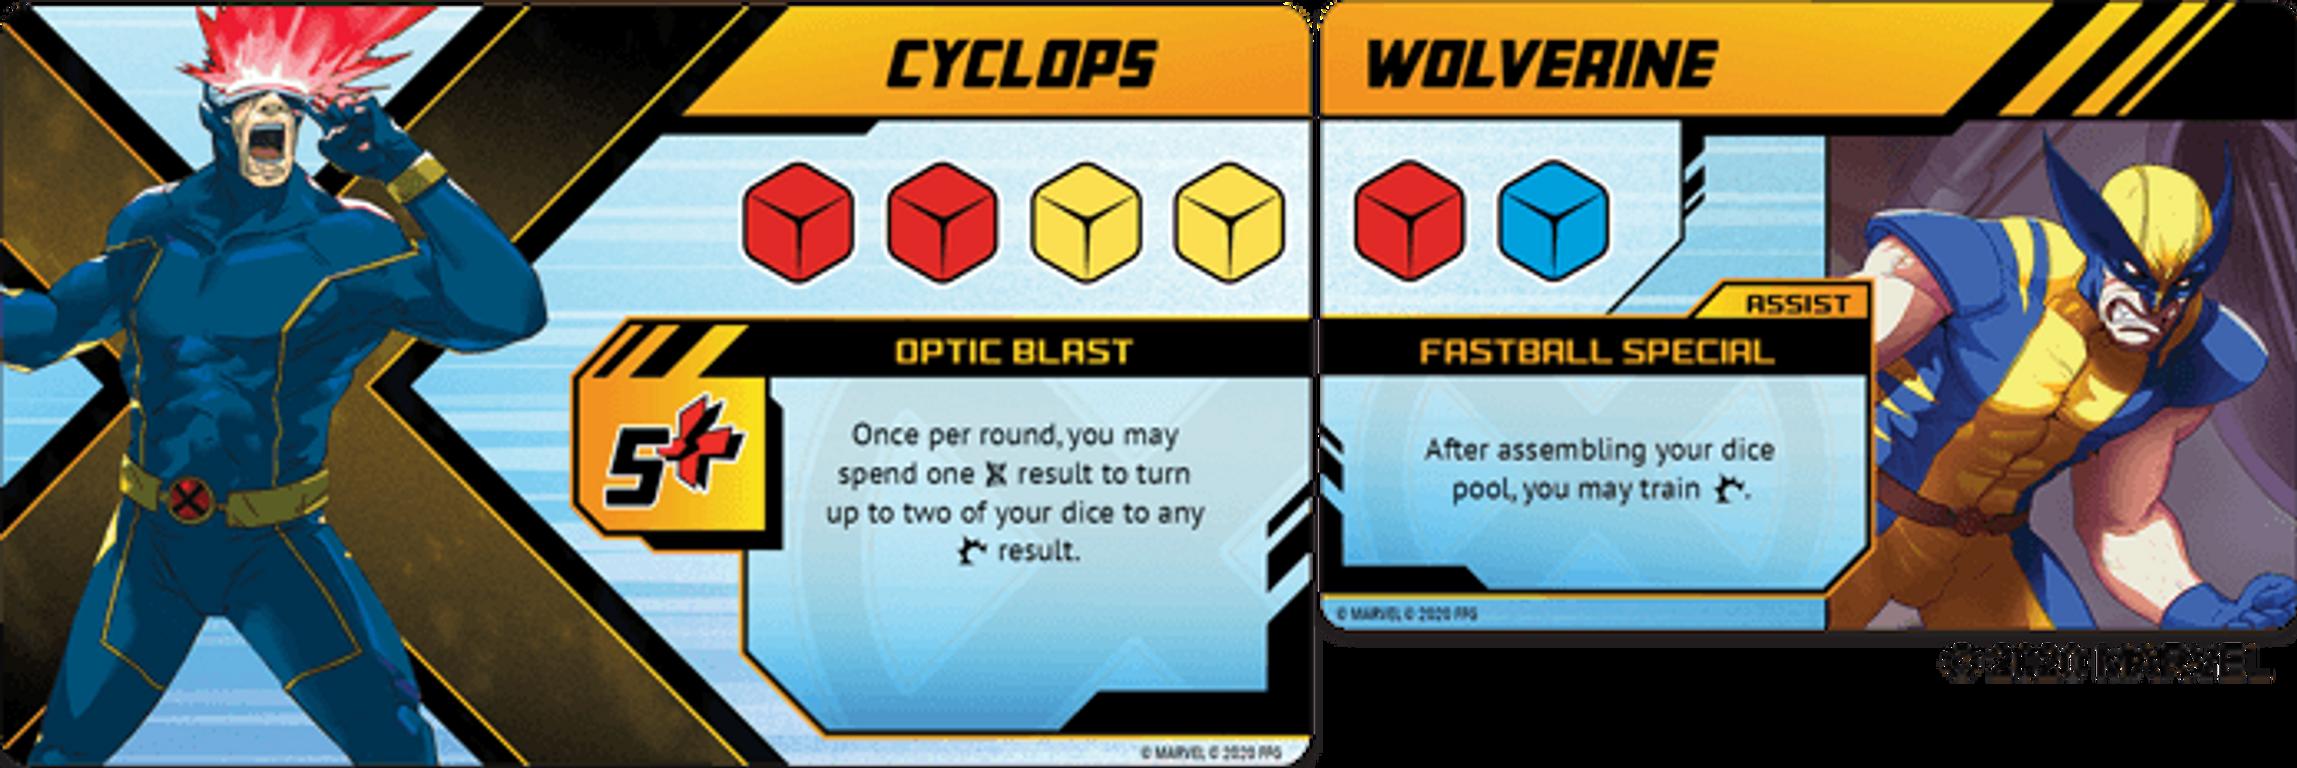 X-Men: Mutant Insurrection cards